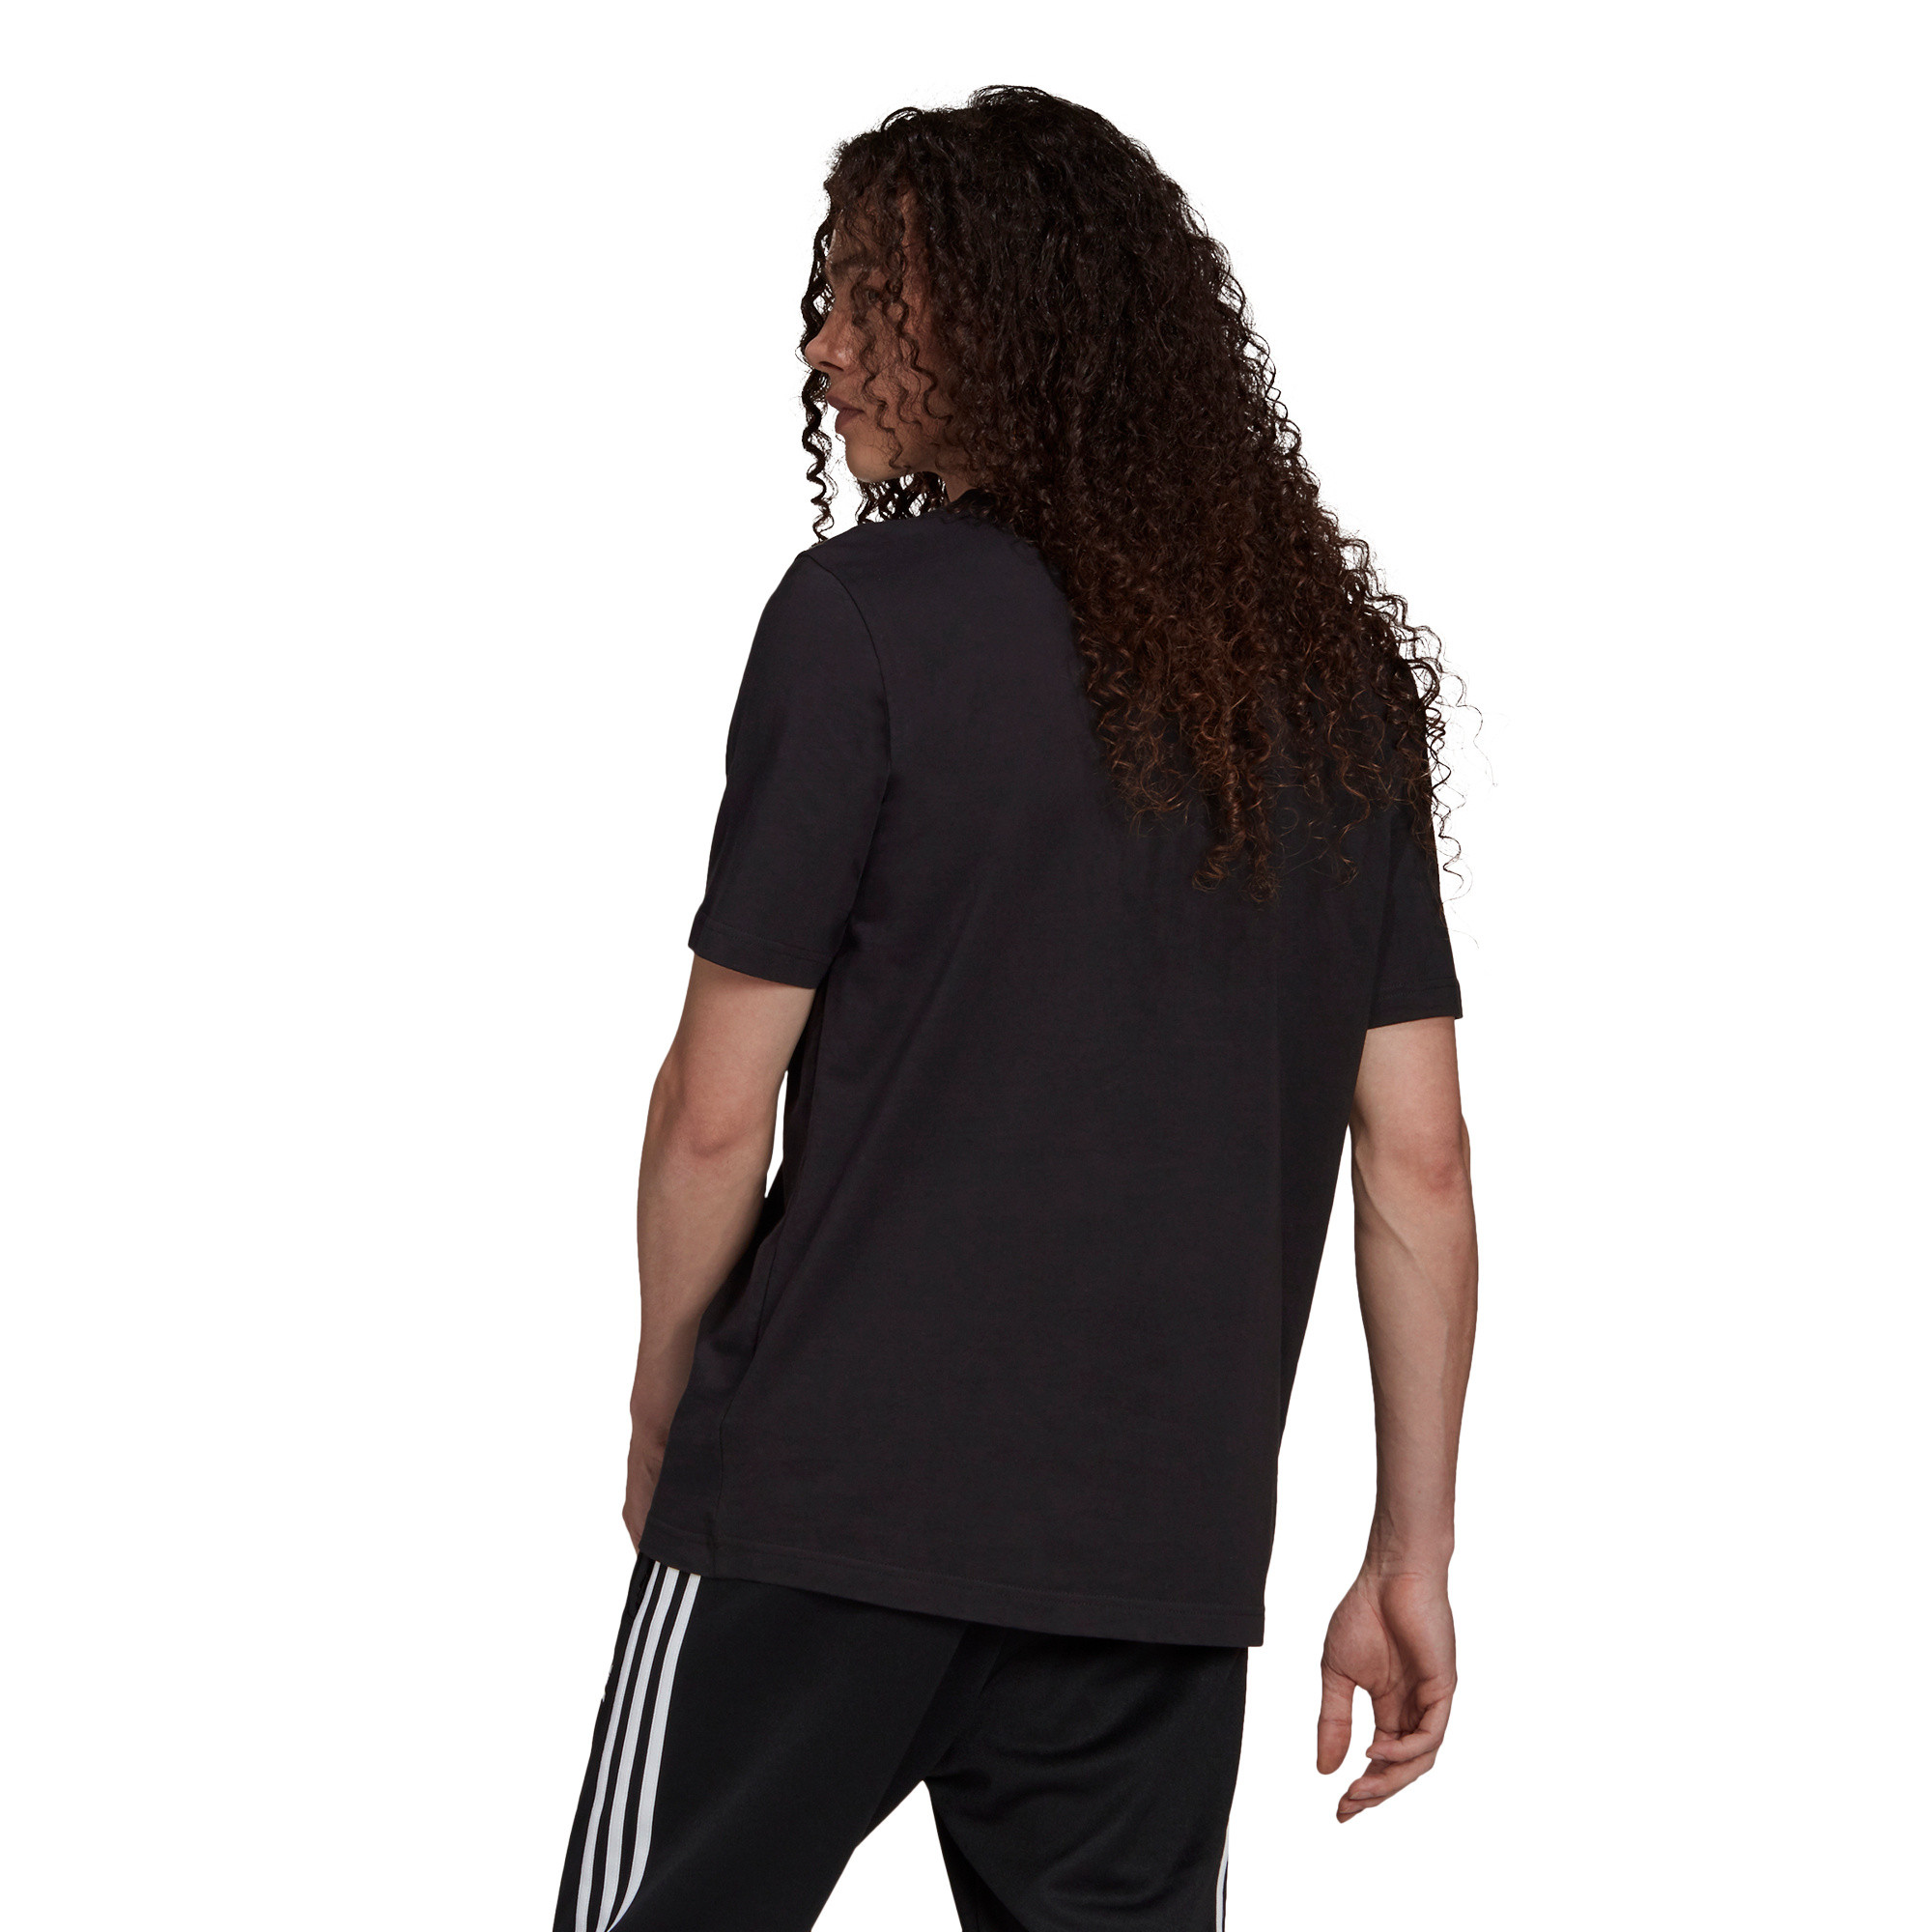 T-shirt uomo adicolor Classics Trefoil, Nero/Bianco, large image number 1